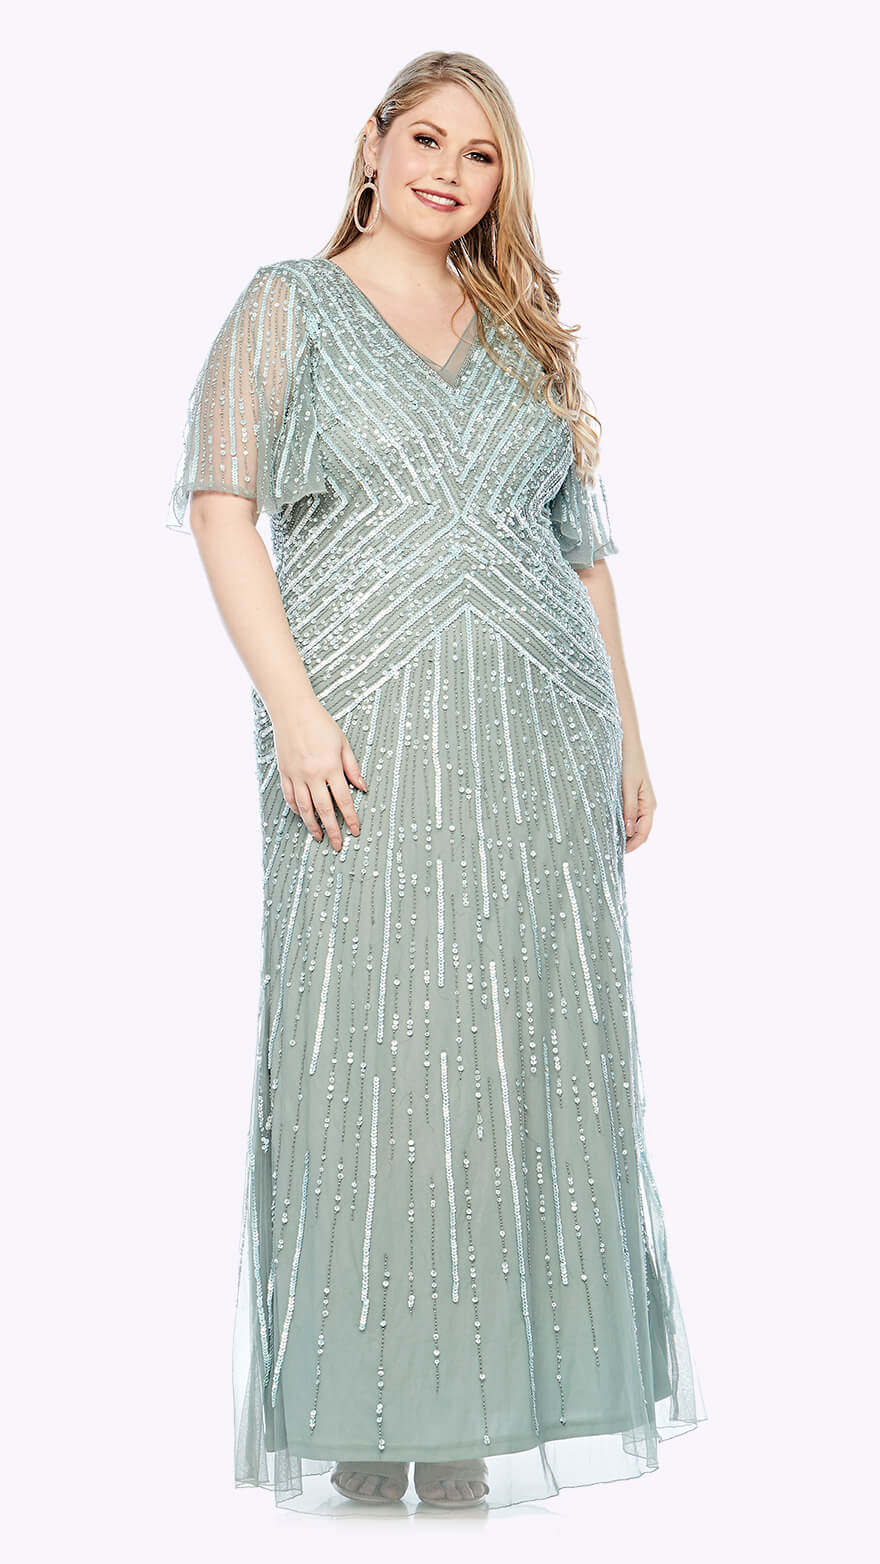 LJ0376 Full-length beaded gown with soft flowy chiffon sleeve